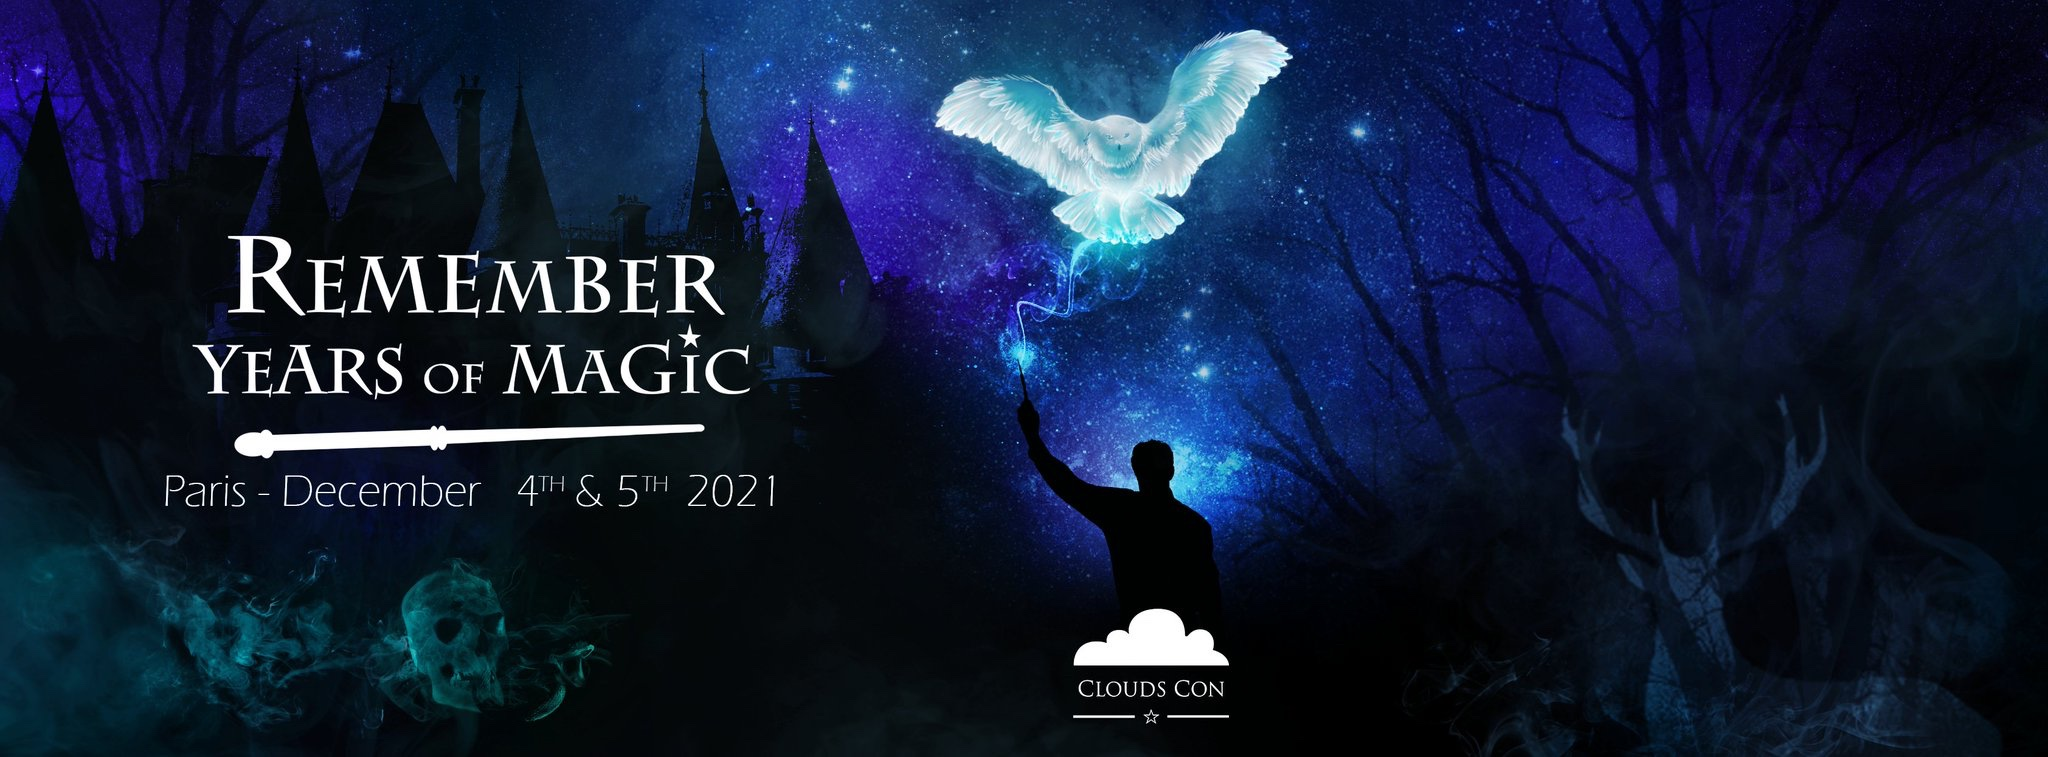 Remember Years of Magic